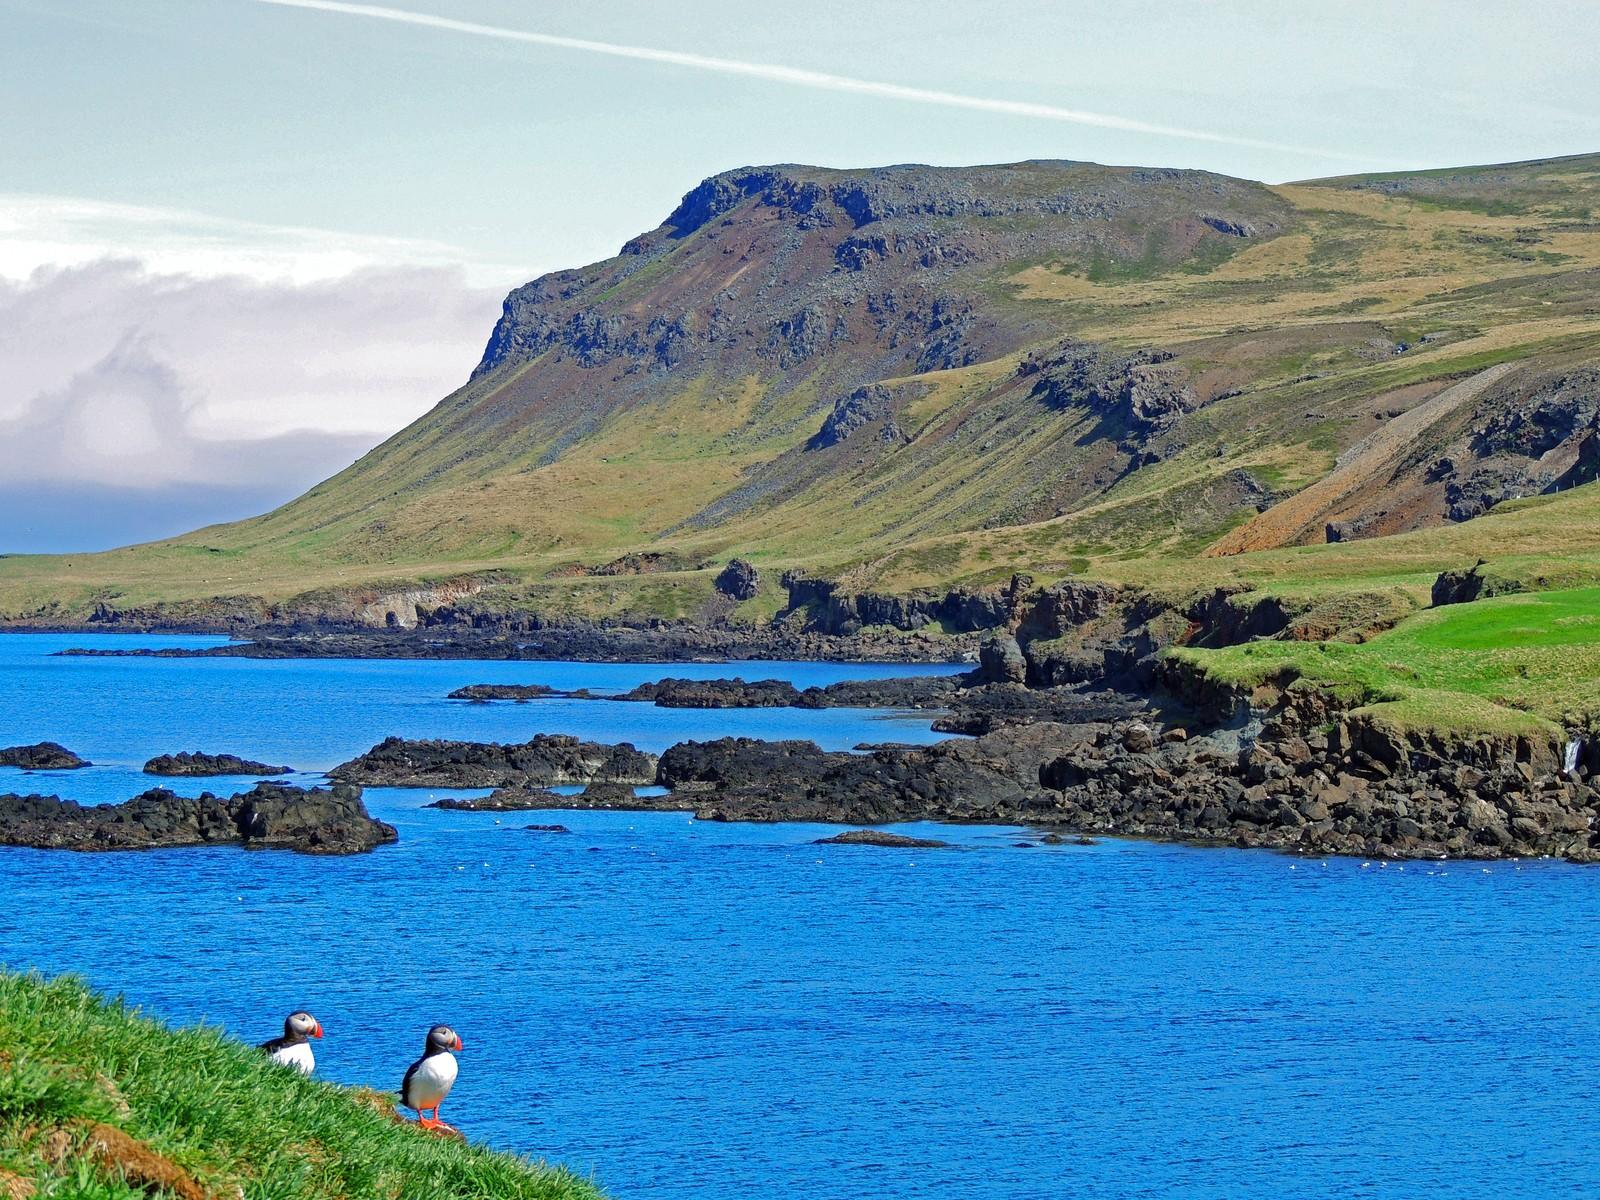 Borgarfjörður in east Iceland